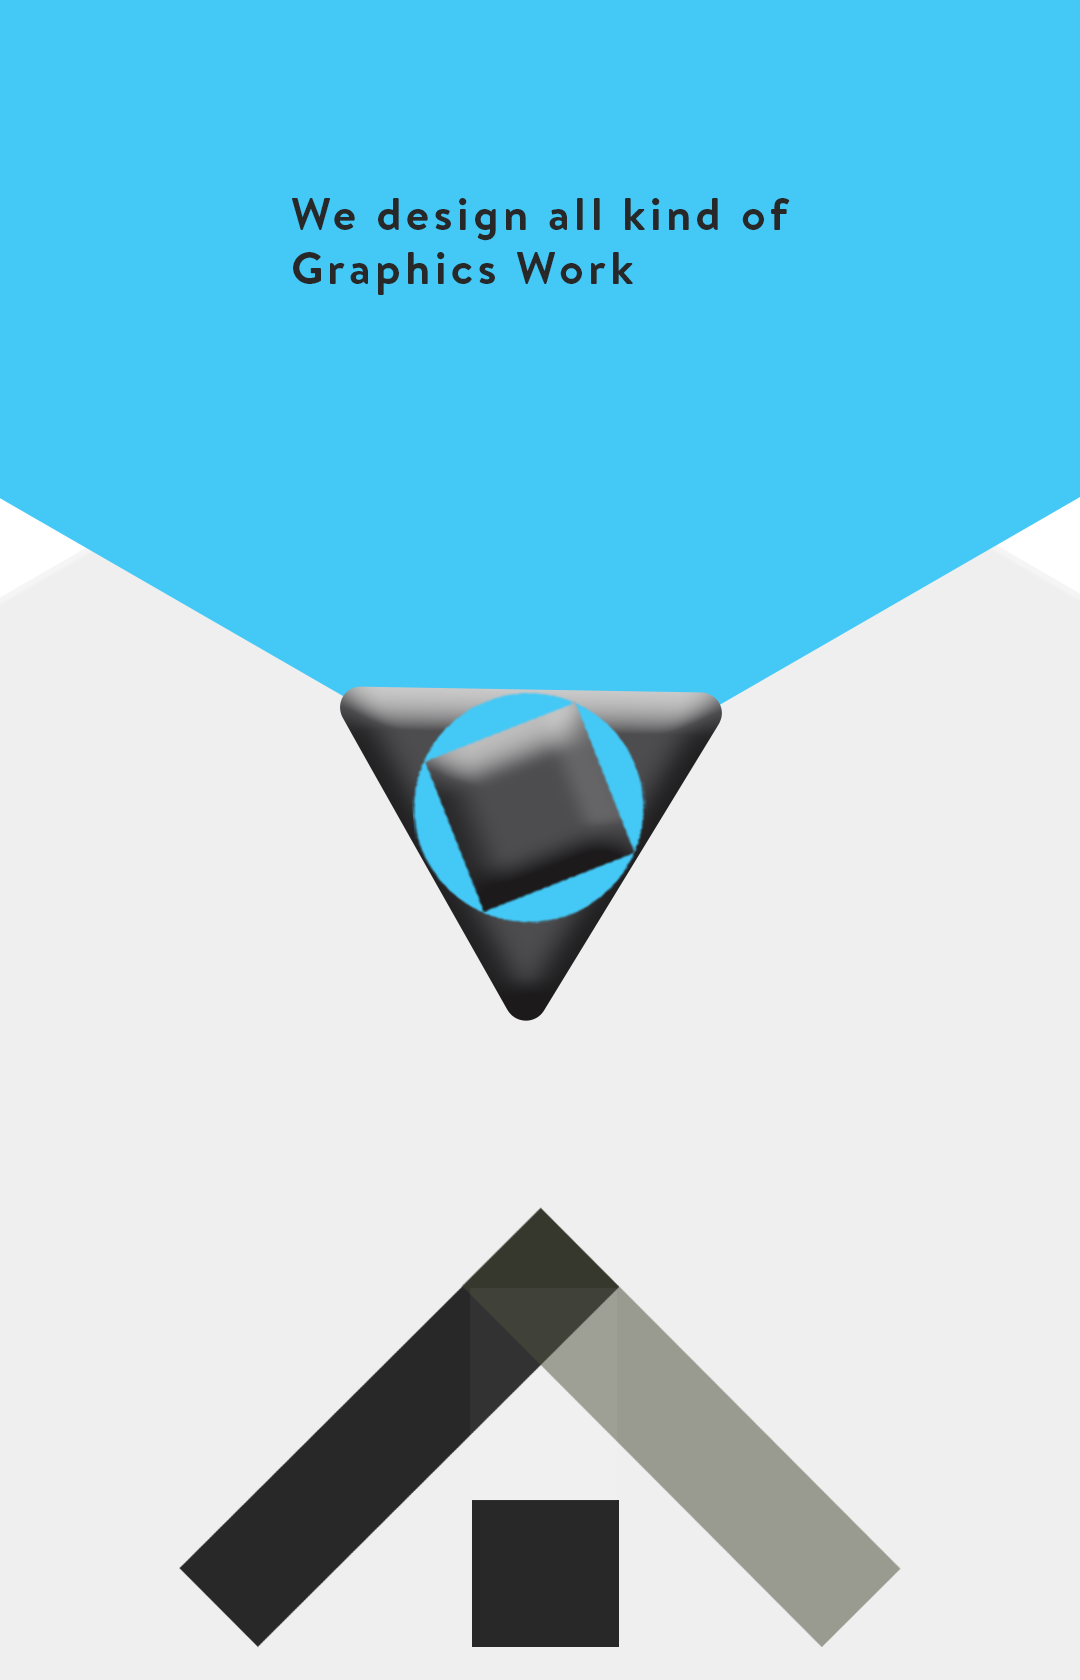 graphics-designing-img-mci